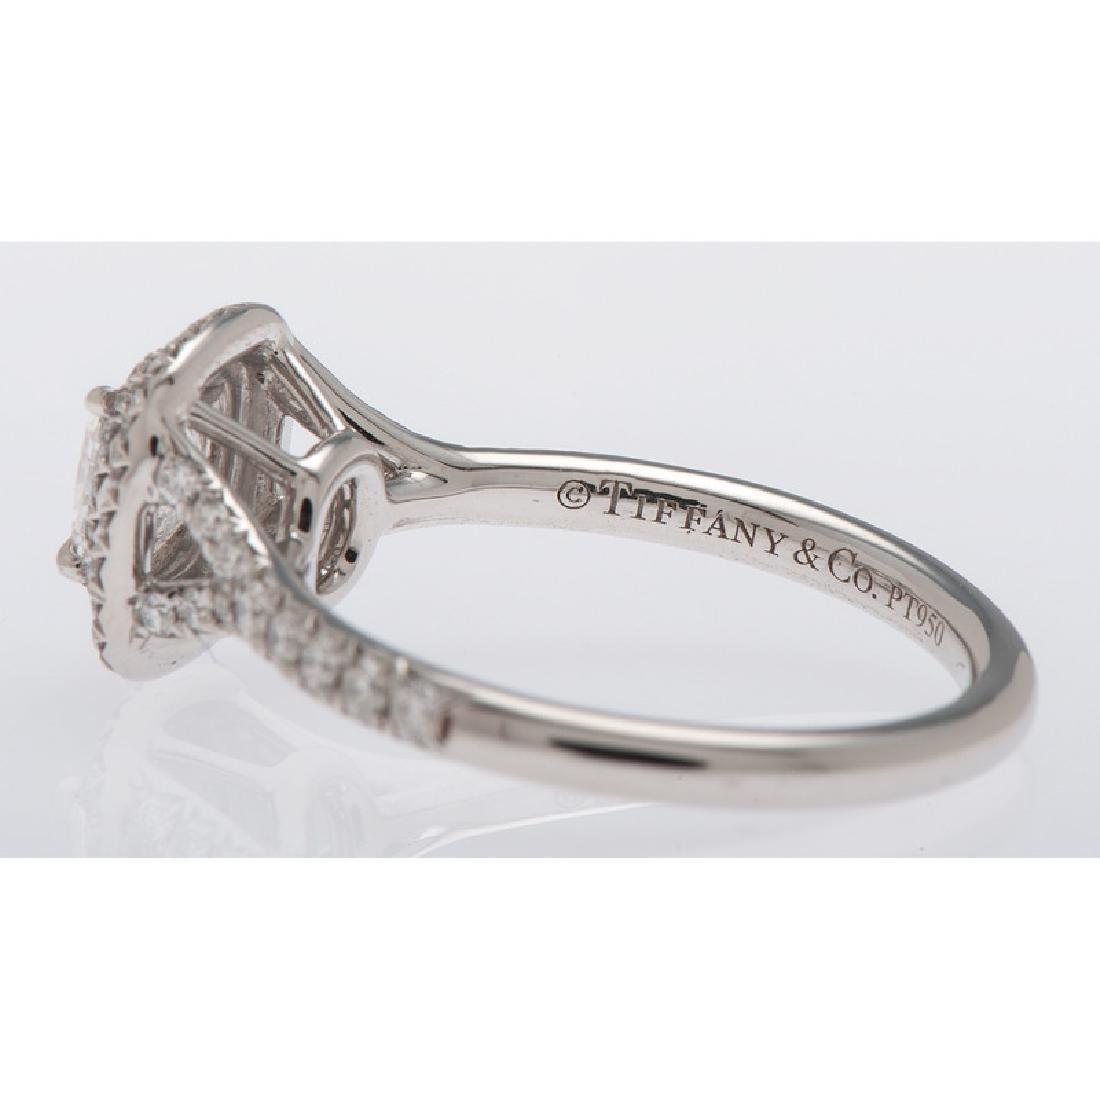 Tiffany & Co. Platinum Soleste Diamond Ring - 4